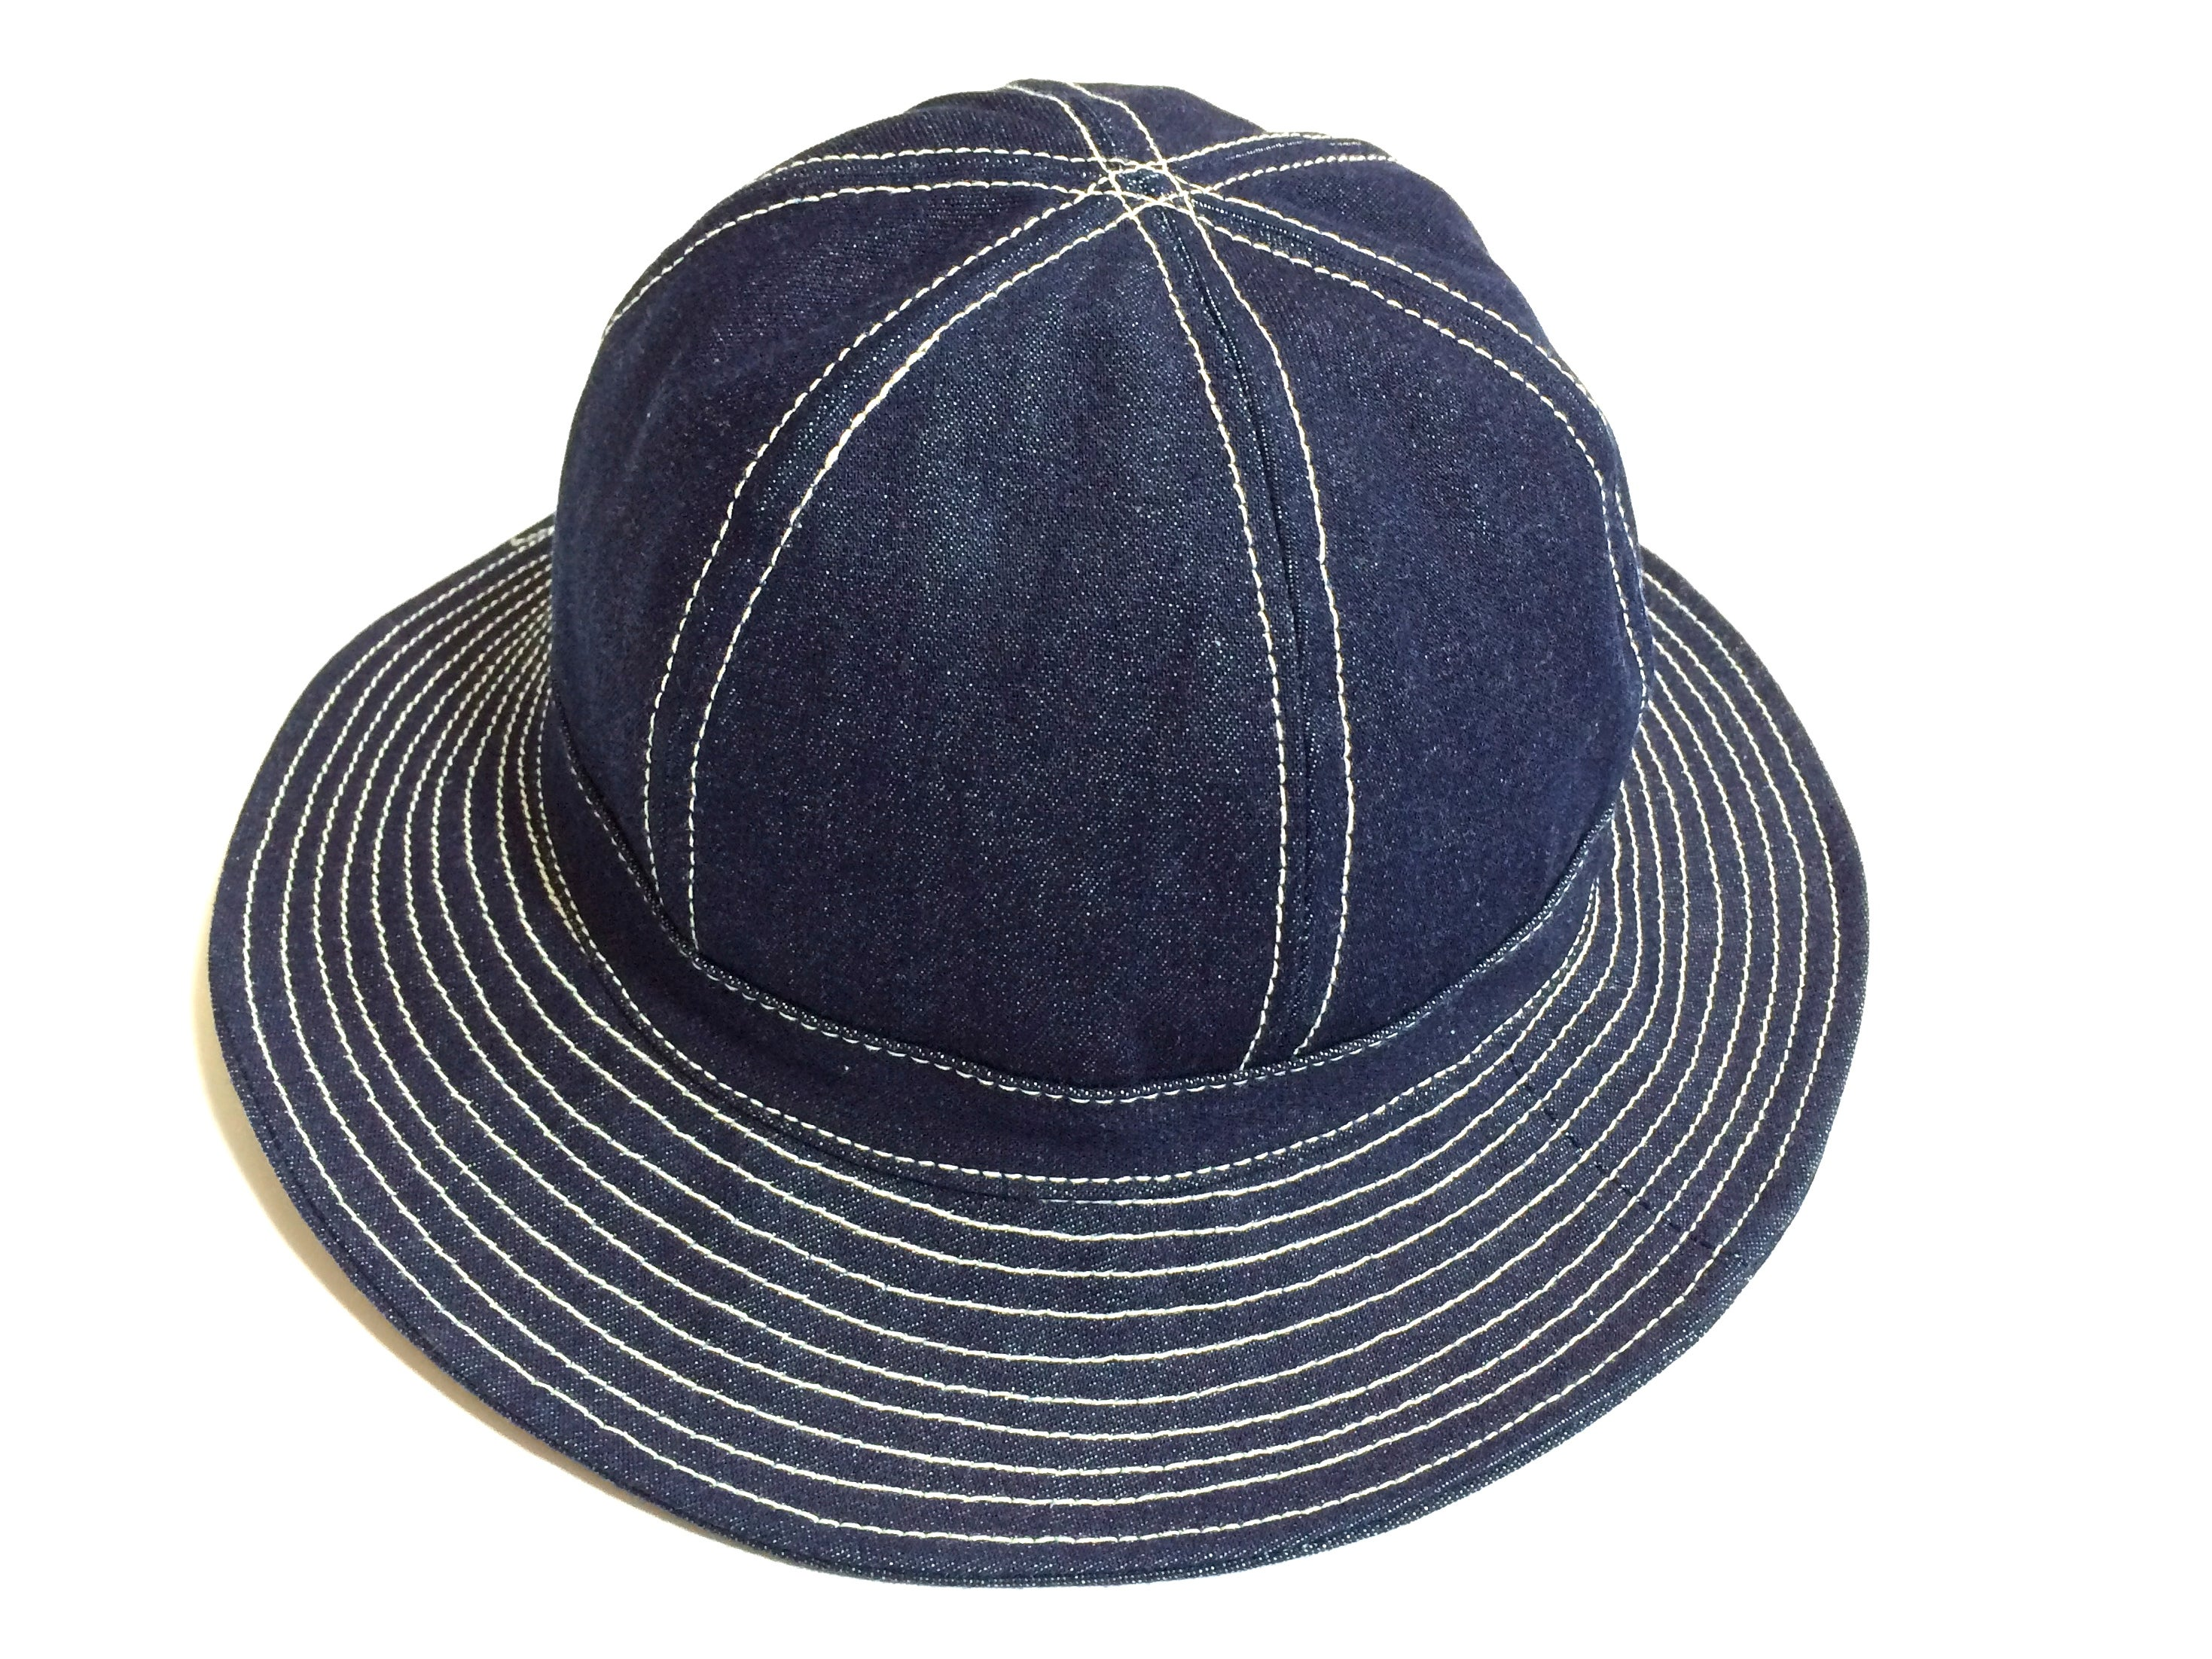 Image of WWII DAISY MAE DENIM HAT